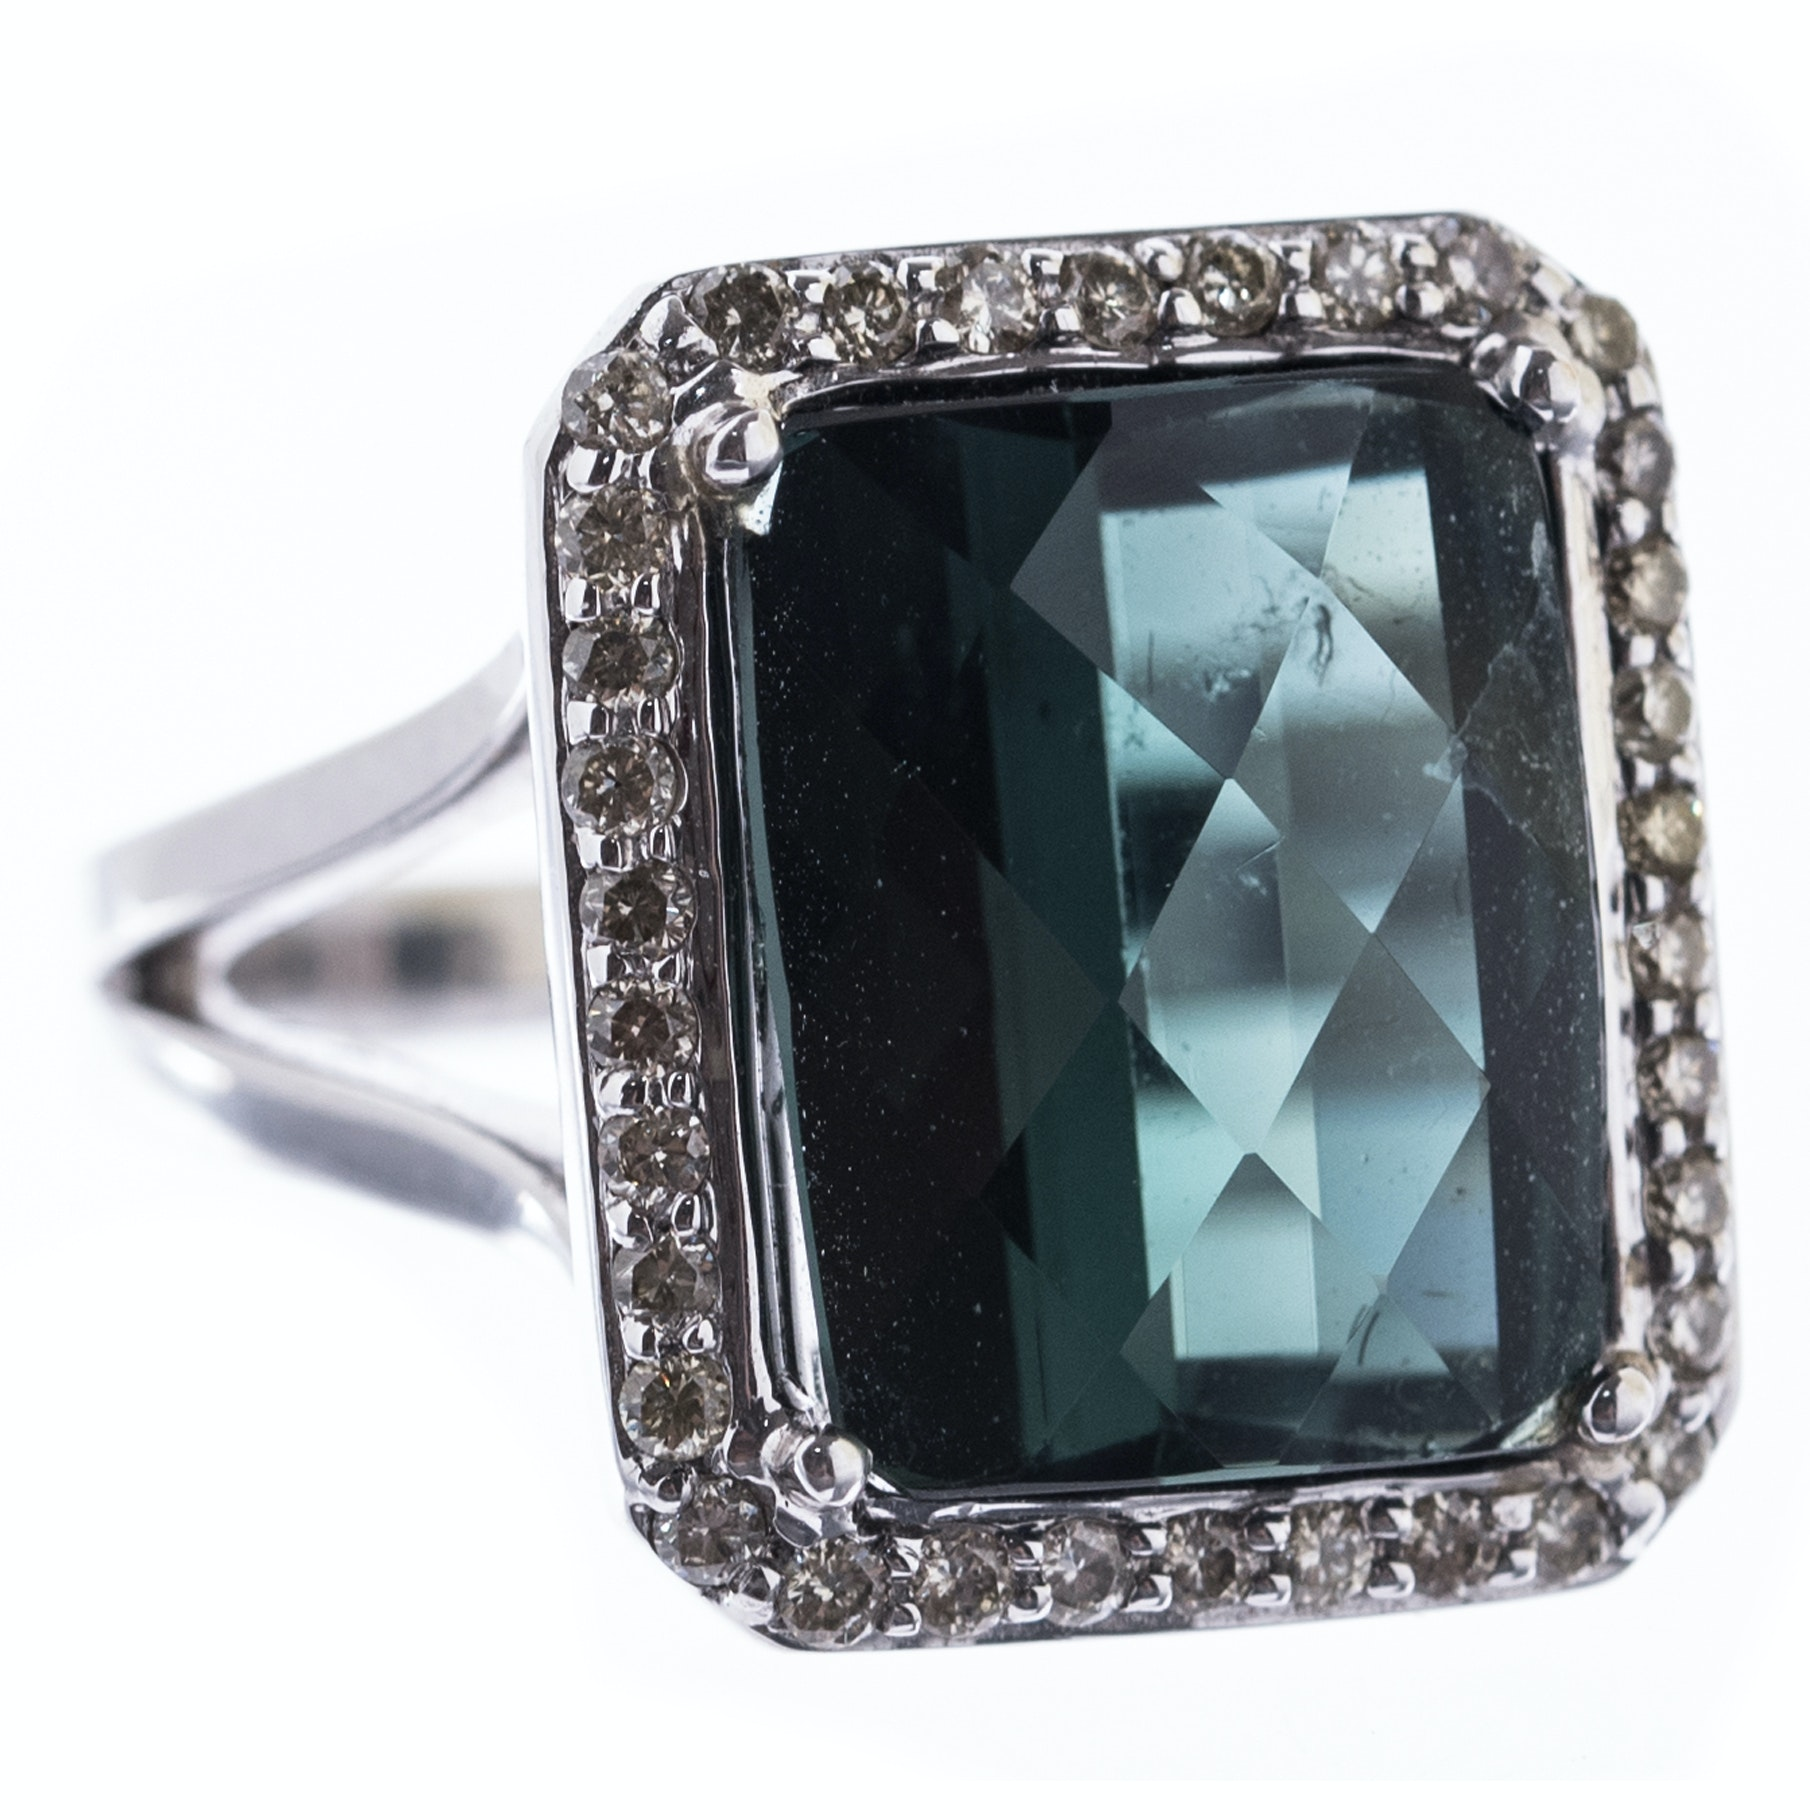 14K White Gold, 5.99 CT Tourmaline, and Diamond Halo Ring